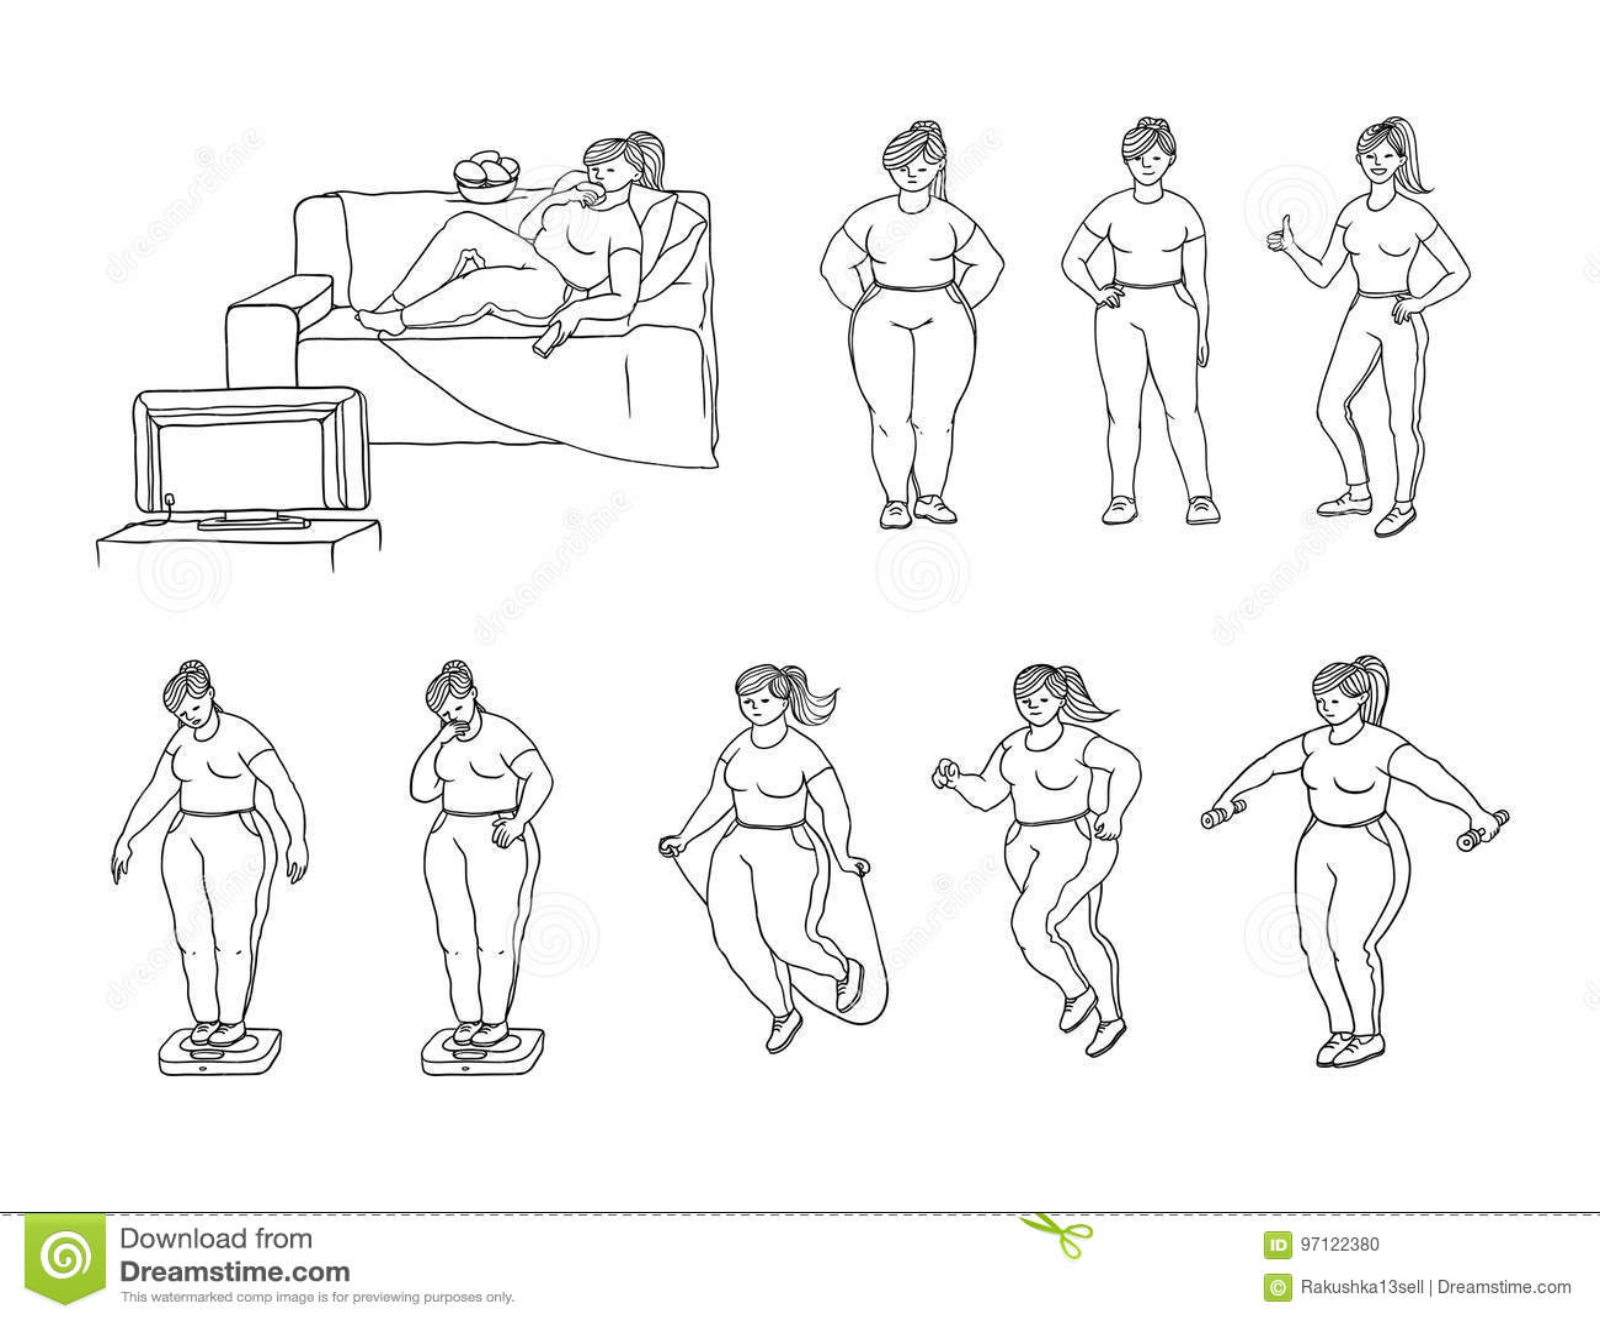 Fat girl blowjobs